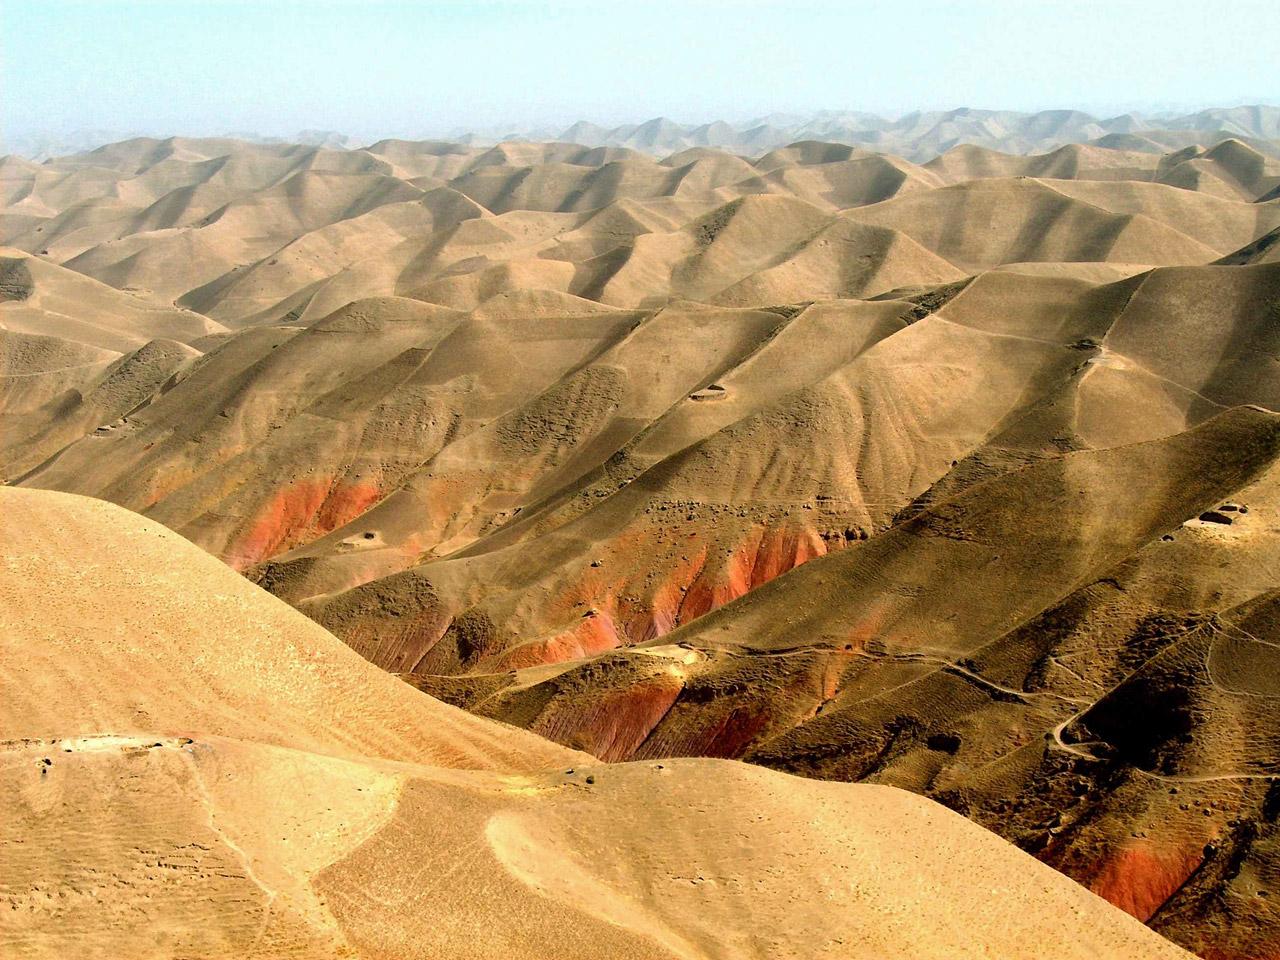 http://1.bp.blogspot.com/-C4FEr3X_XhI/TcMvBYI7jzI/AAAAAAAABOw/_8QA5FzWlN8/s1600/Afghanistan-Wallpaper_0505201101.jpg